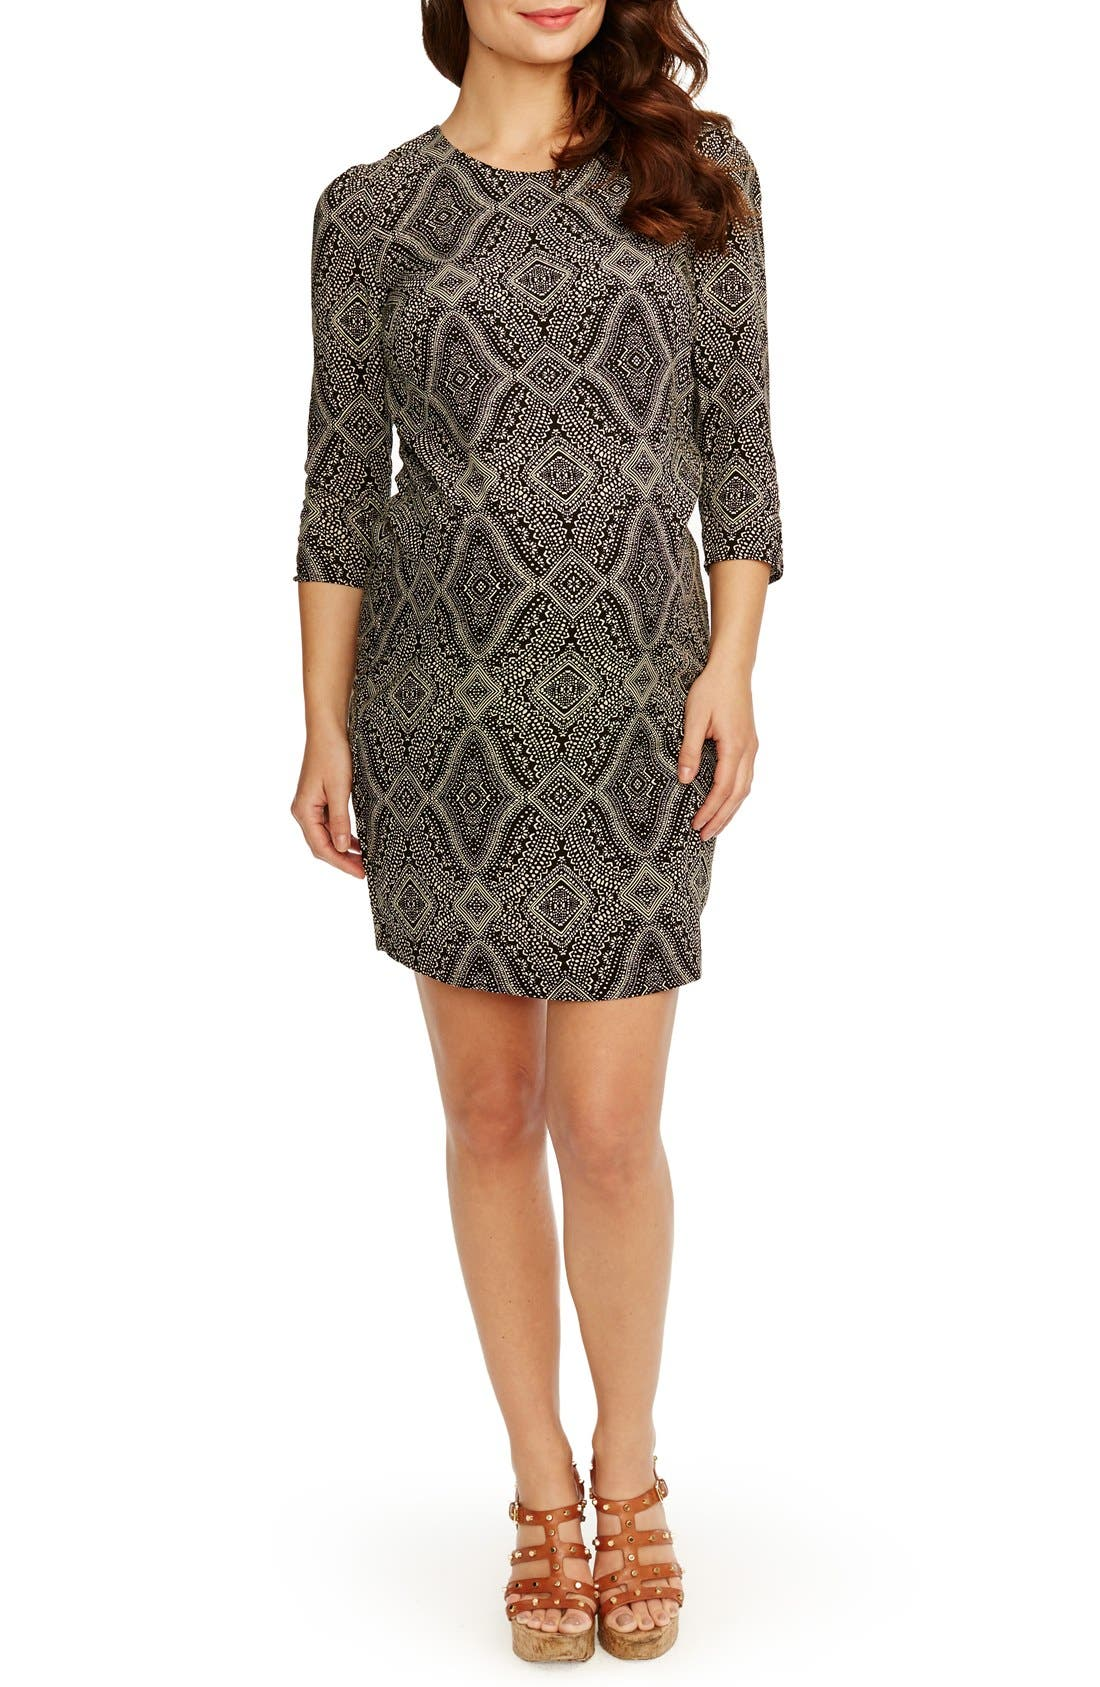 Rosie Pope 'Sloane' Maternity Dress